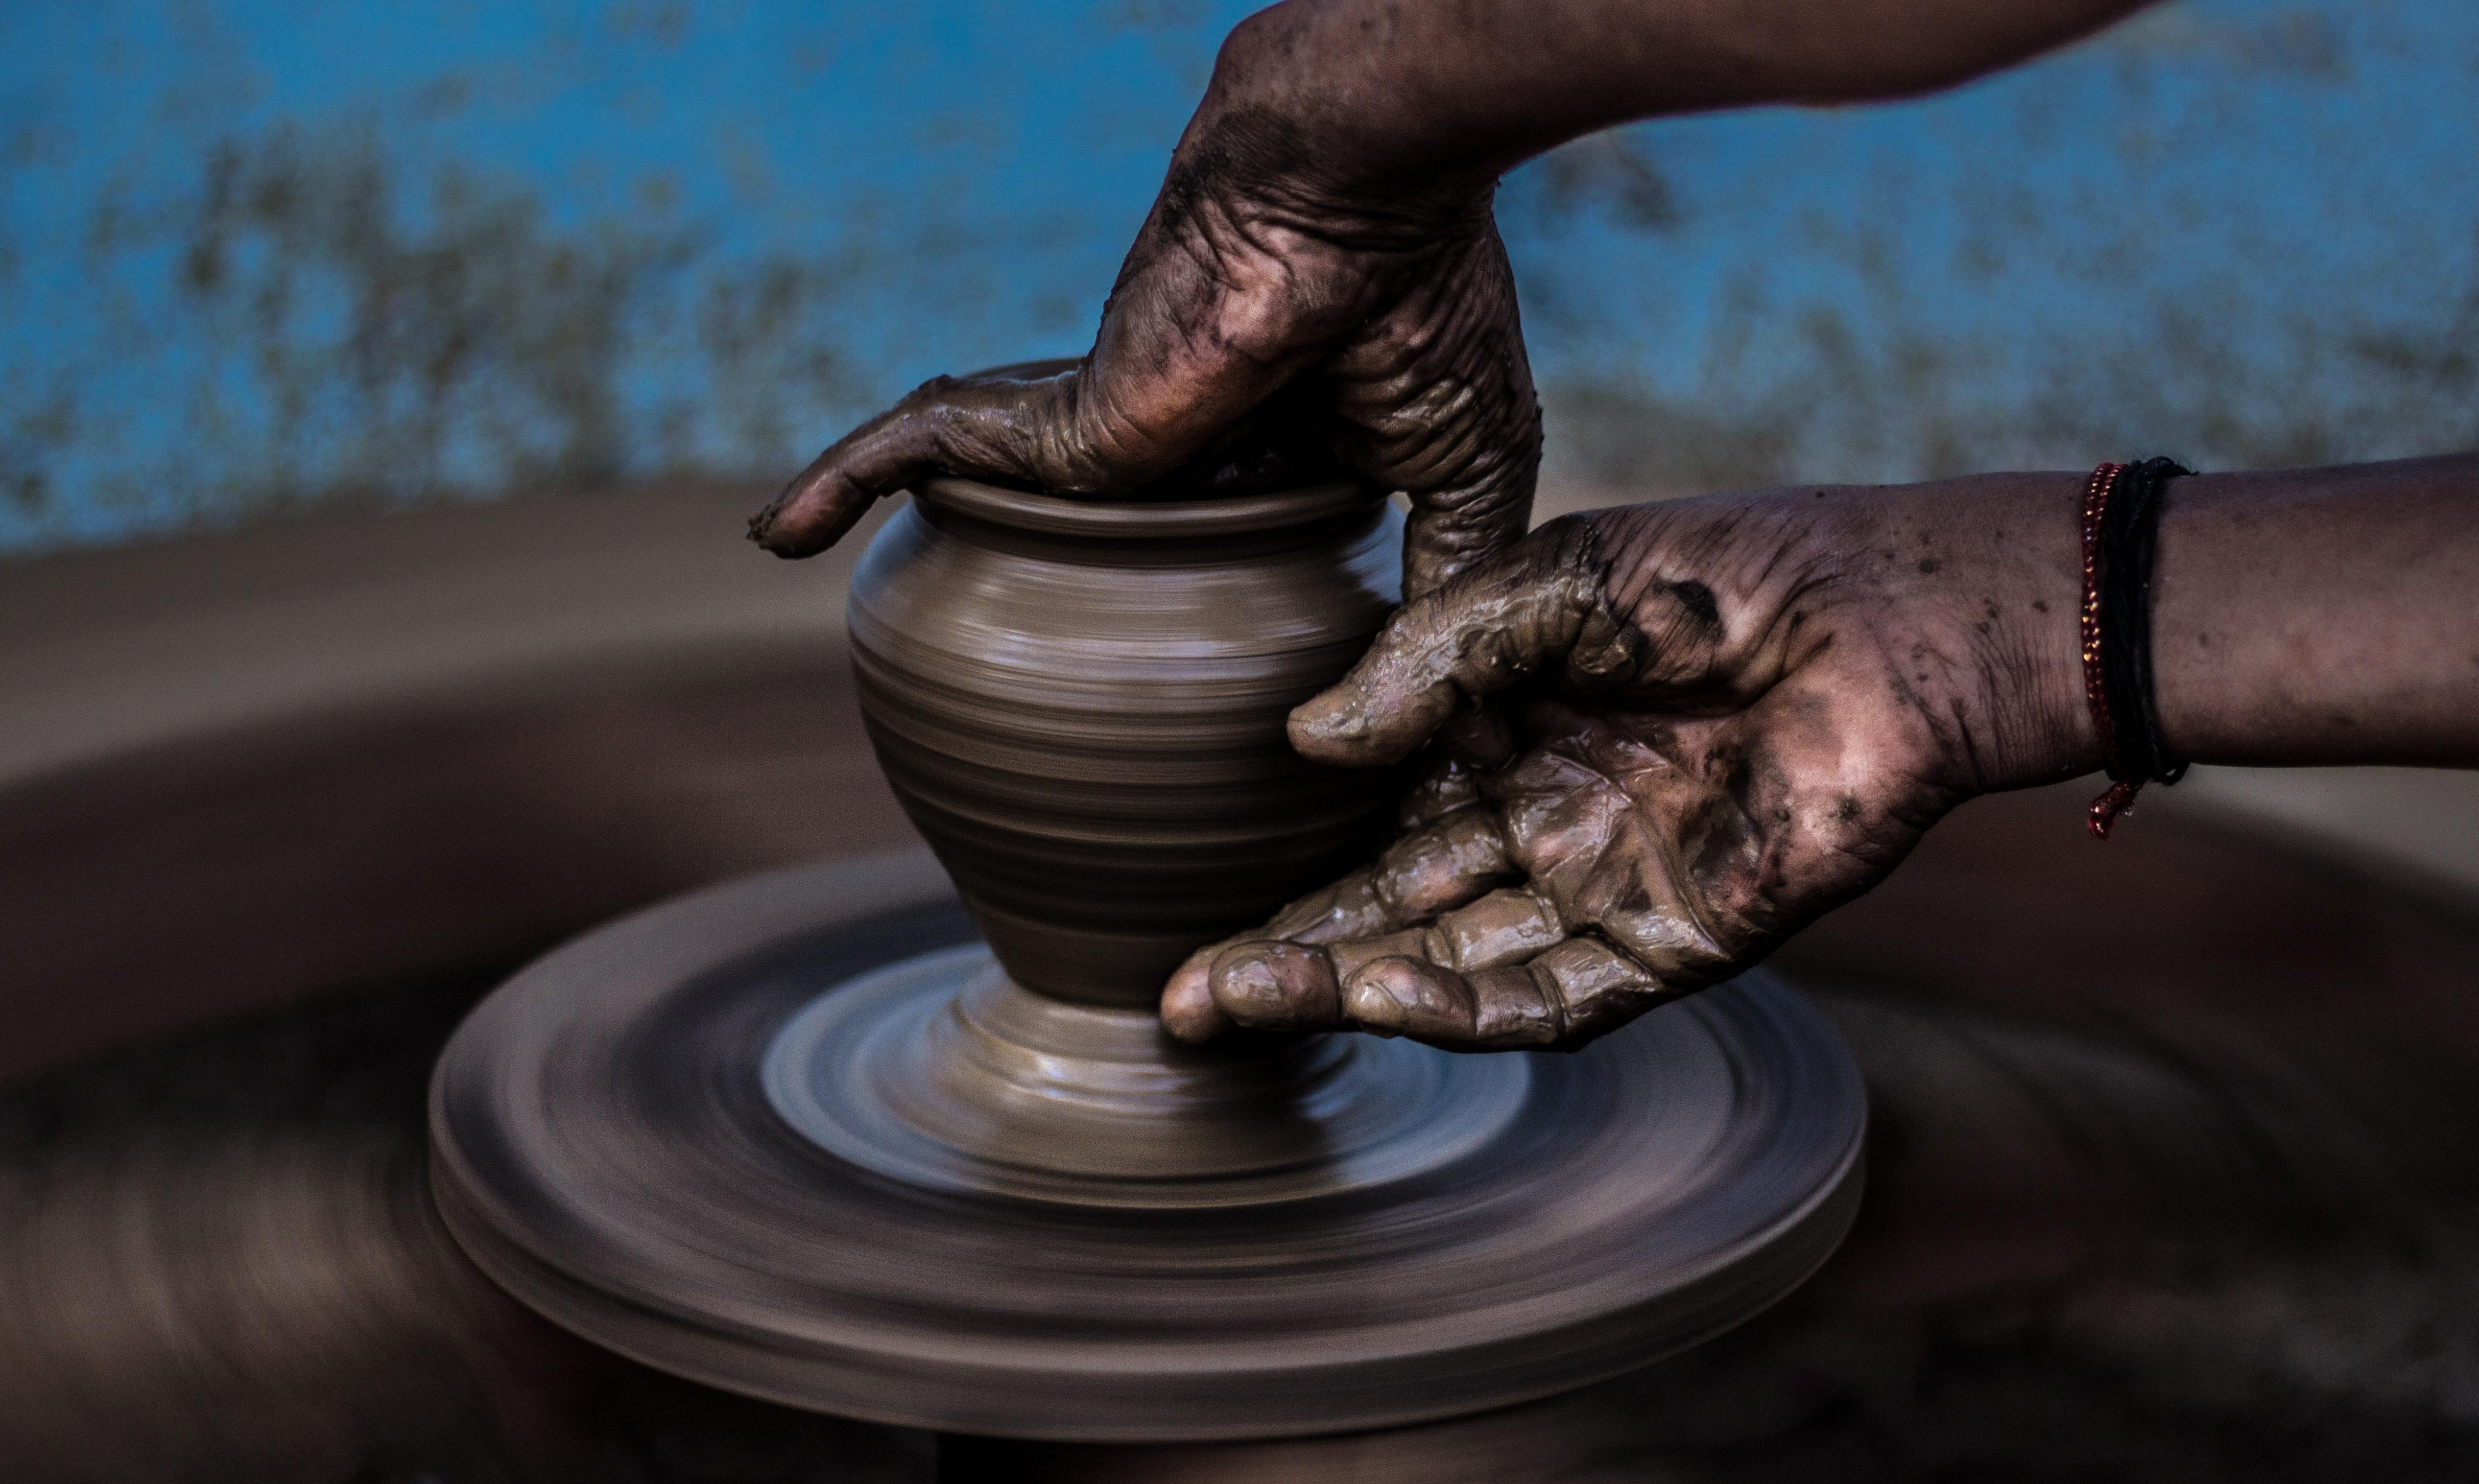 person molding vase